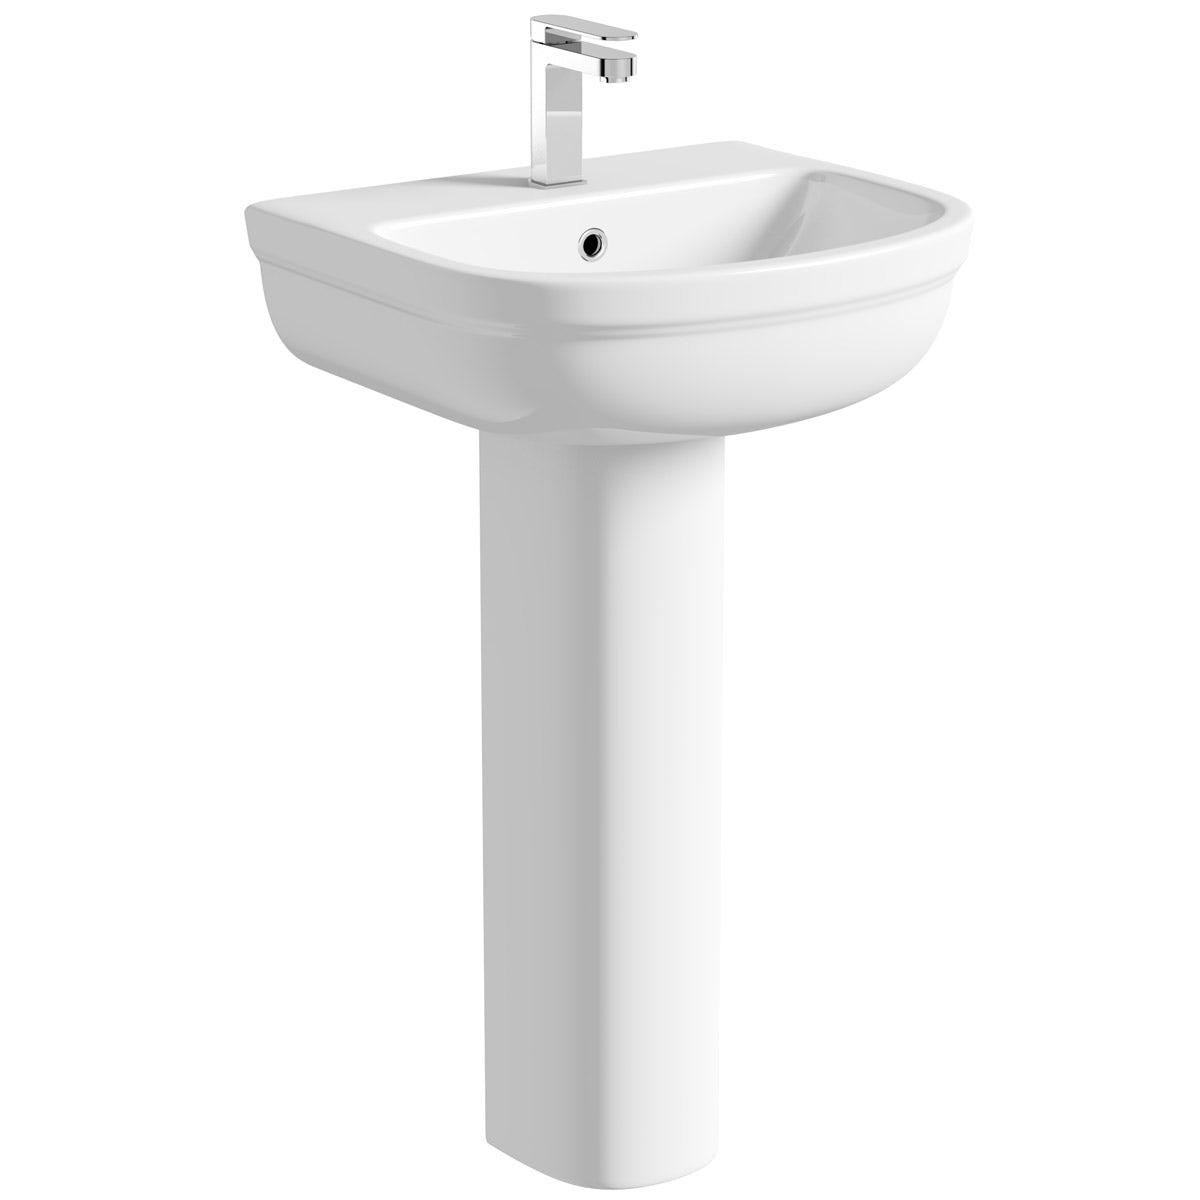 Deco full pedestal basin 550mm